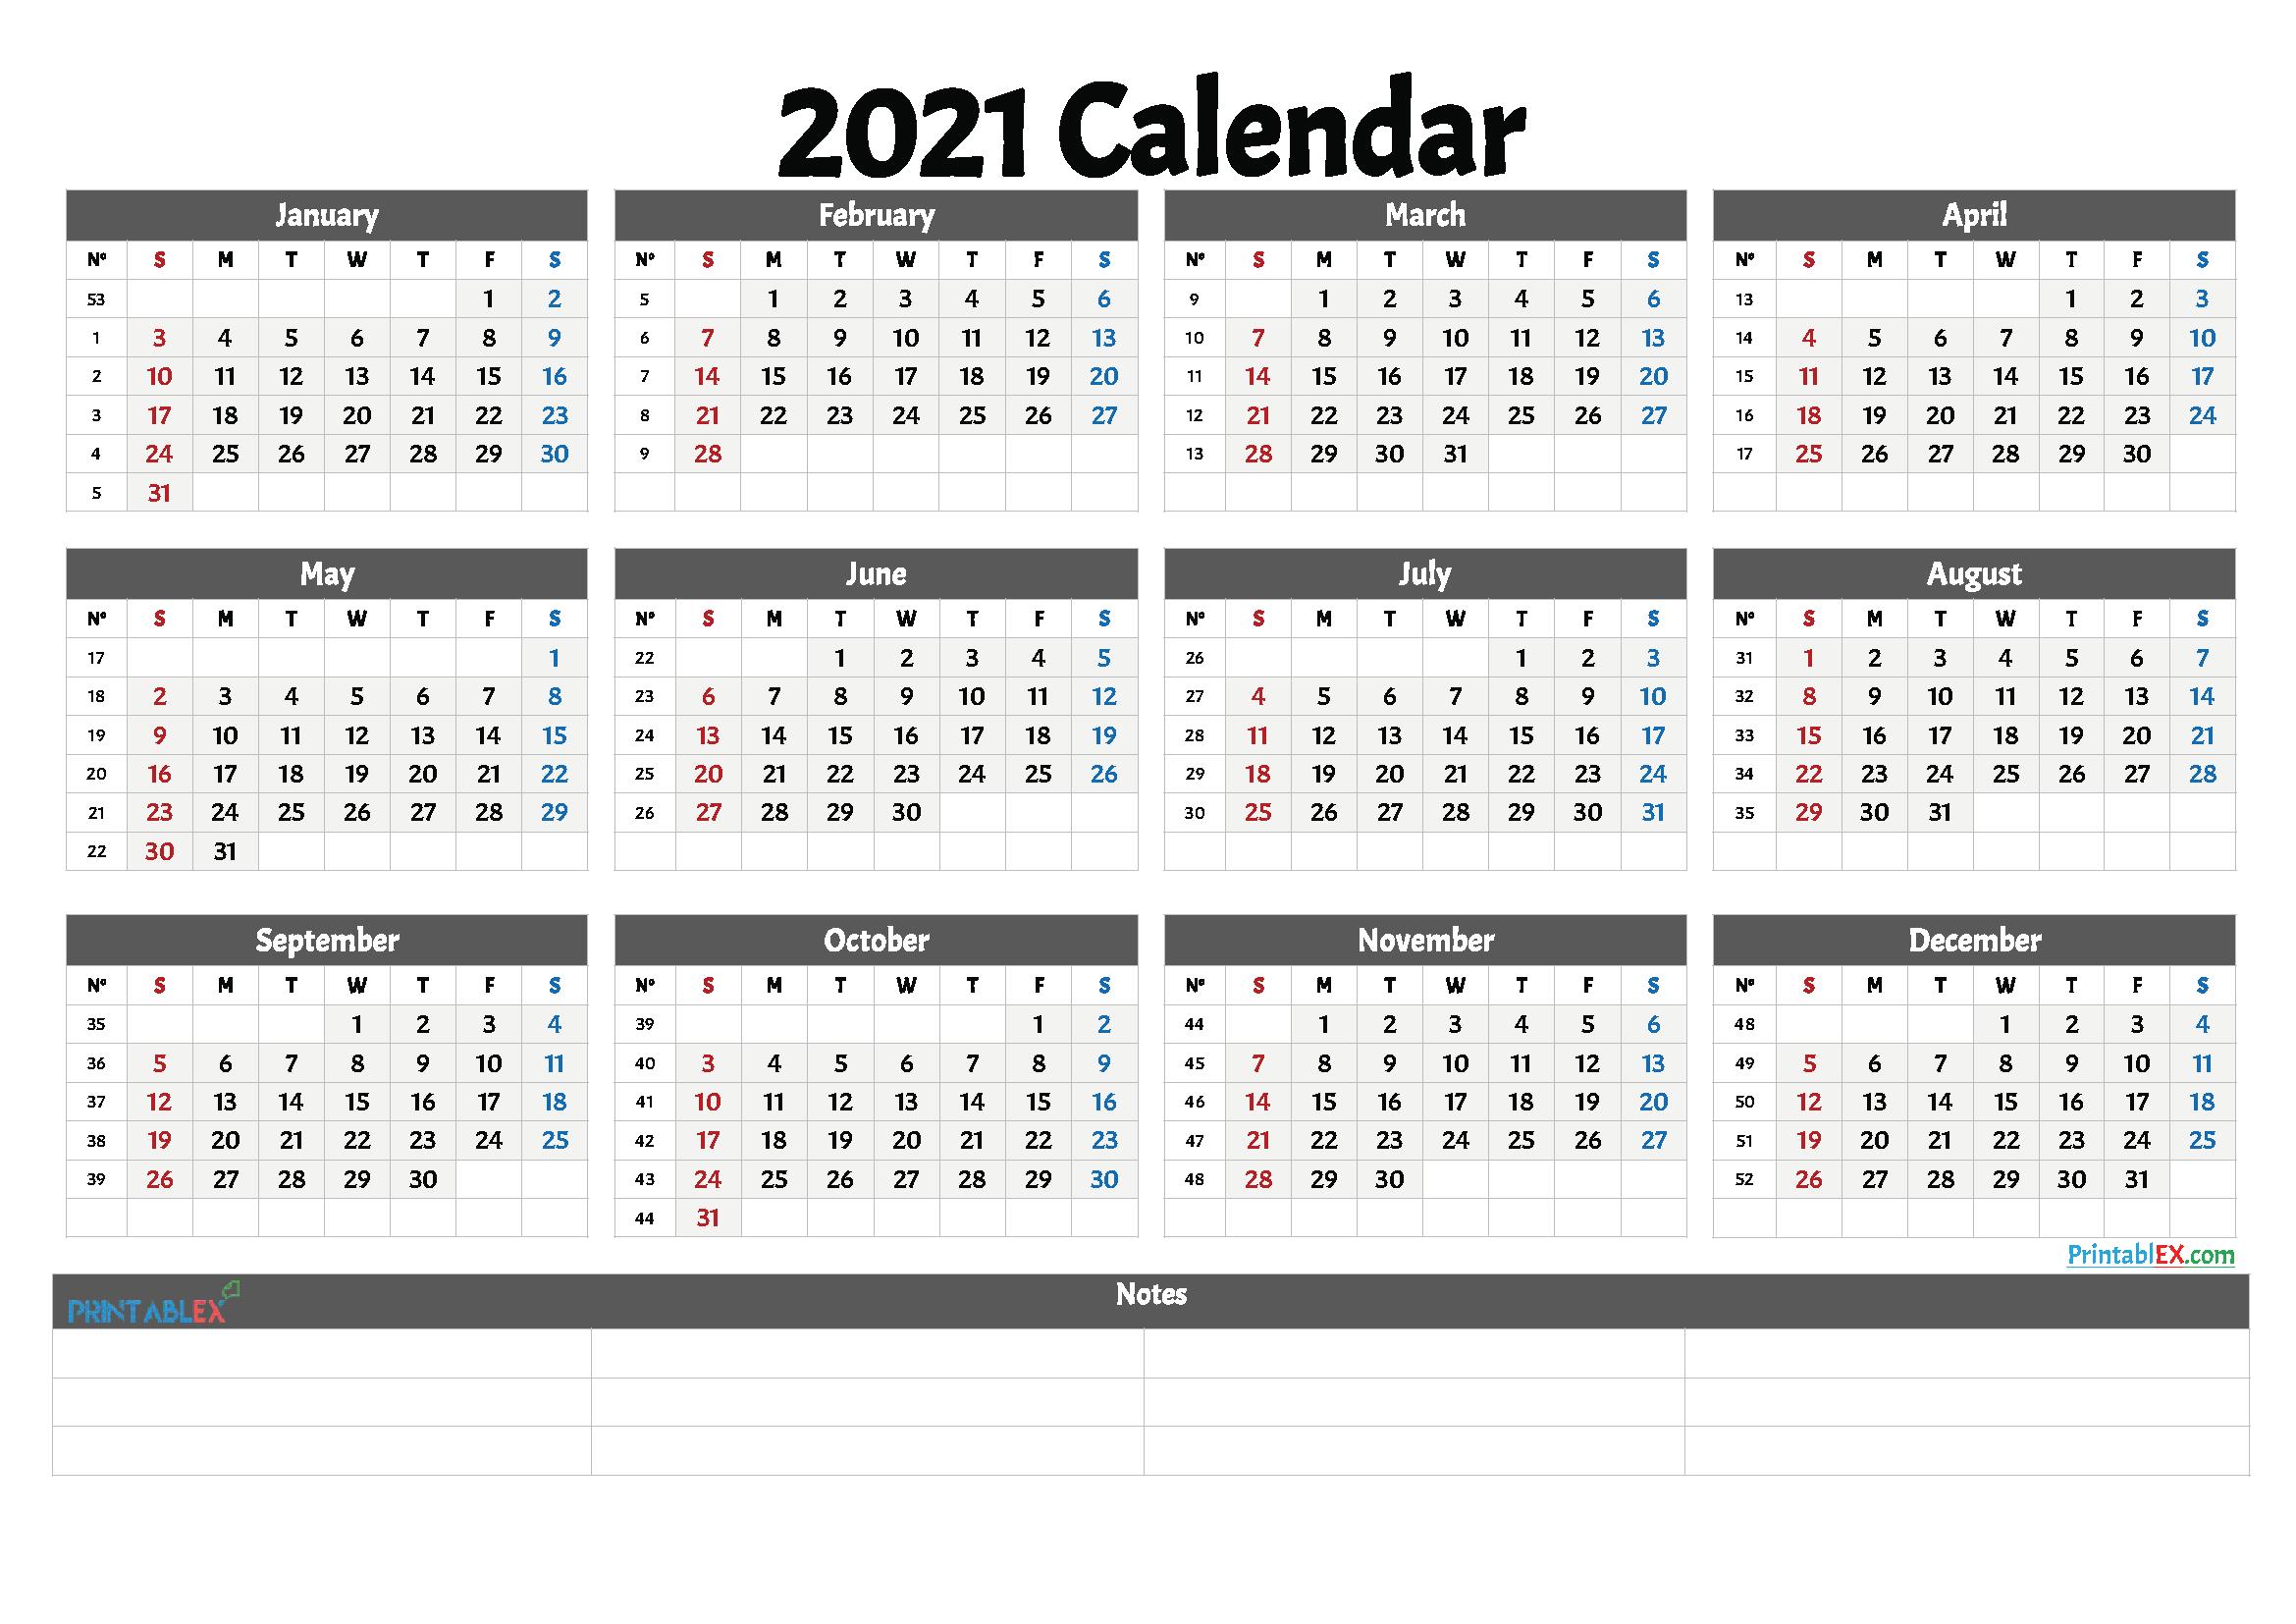 2021 Free Printable Yearly Calendar With Week Numbers – Free with Monthly Calendar By Week Number 2021